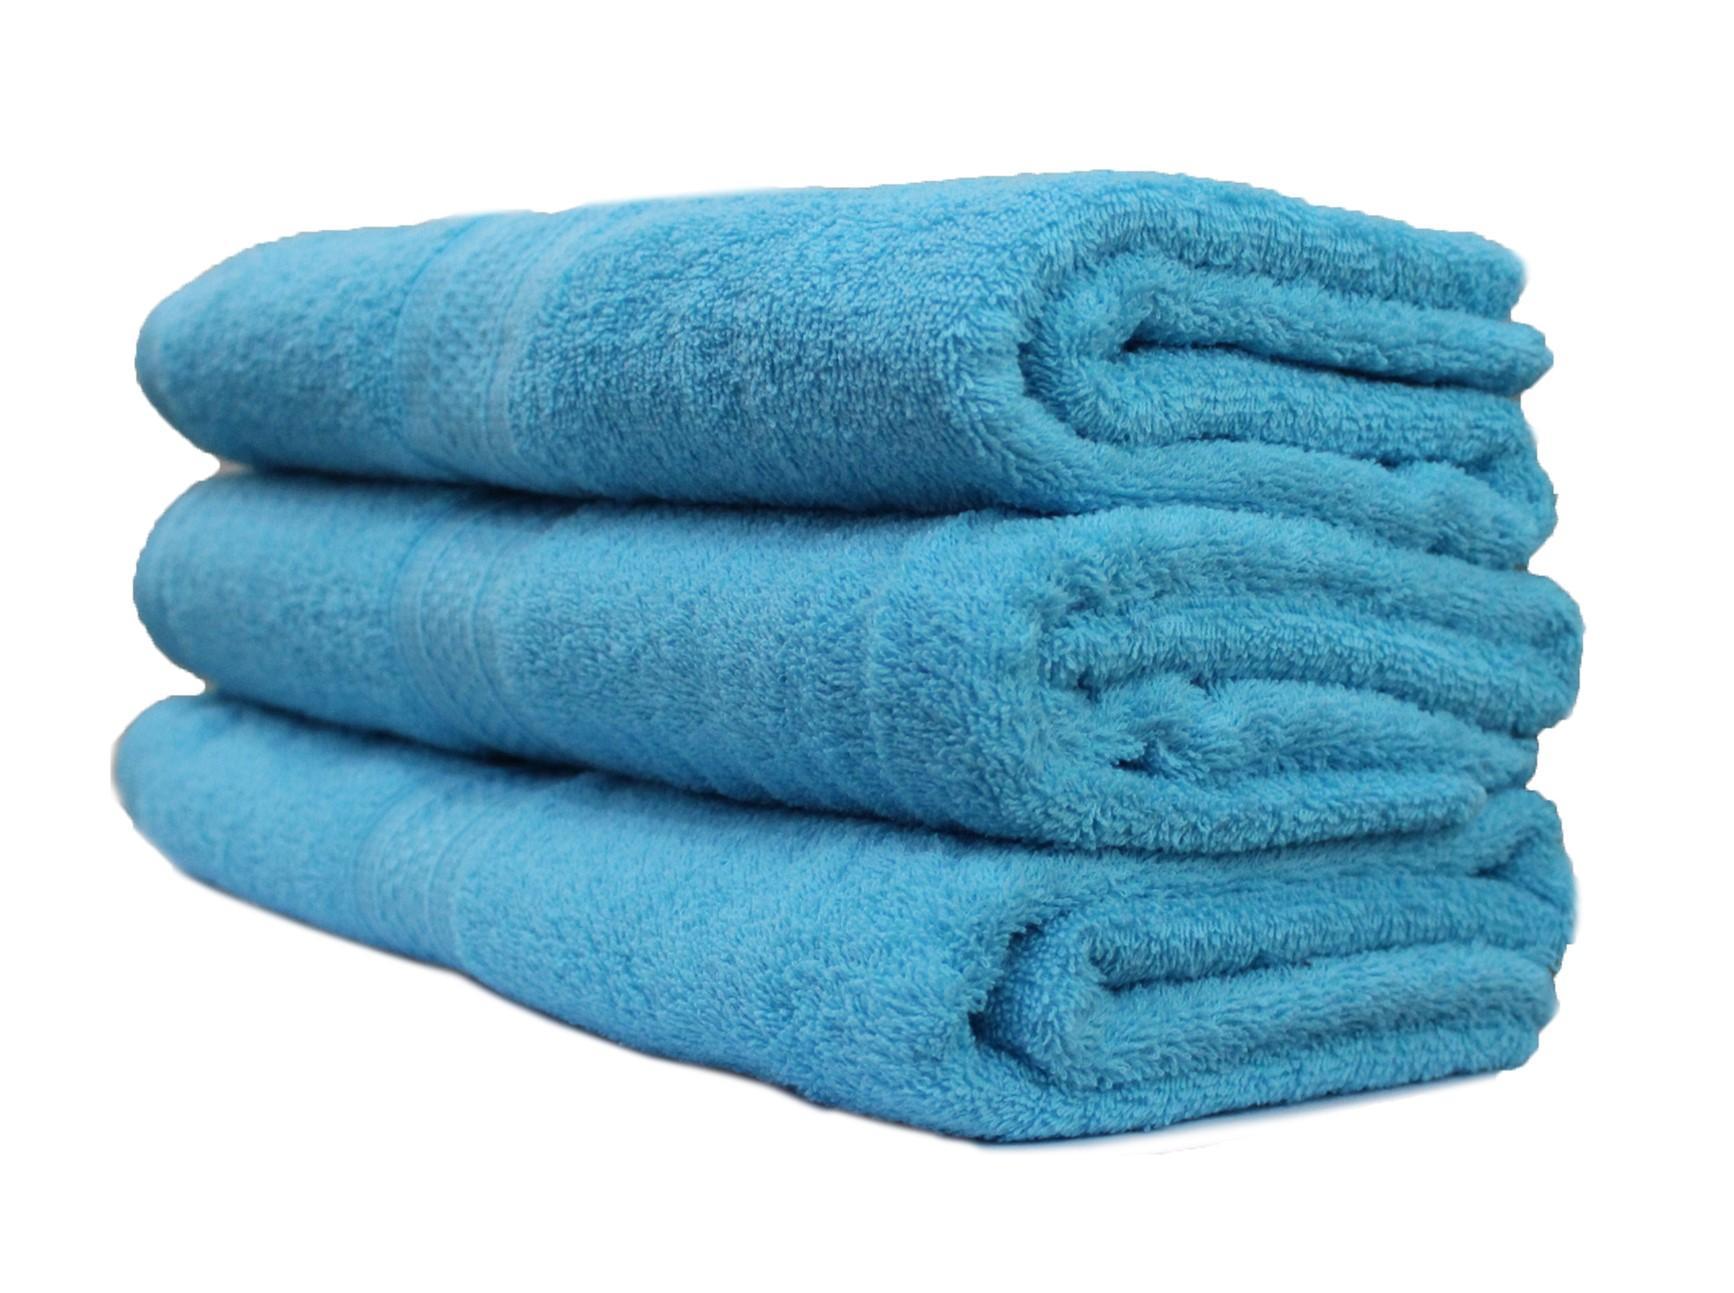 Cuci Gudang SATUAN Handuk Travel / Salon / Hotel / Bath Towels Premium 50x100